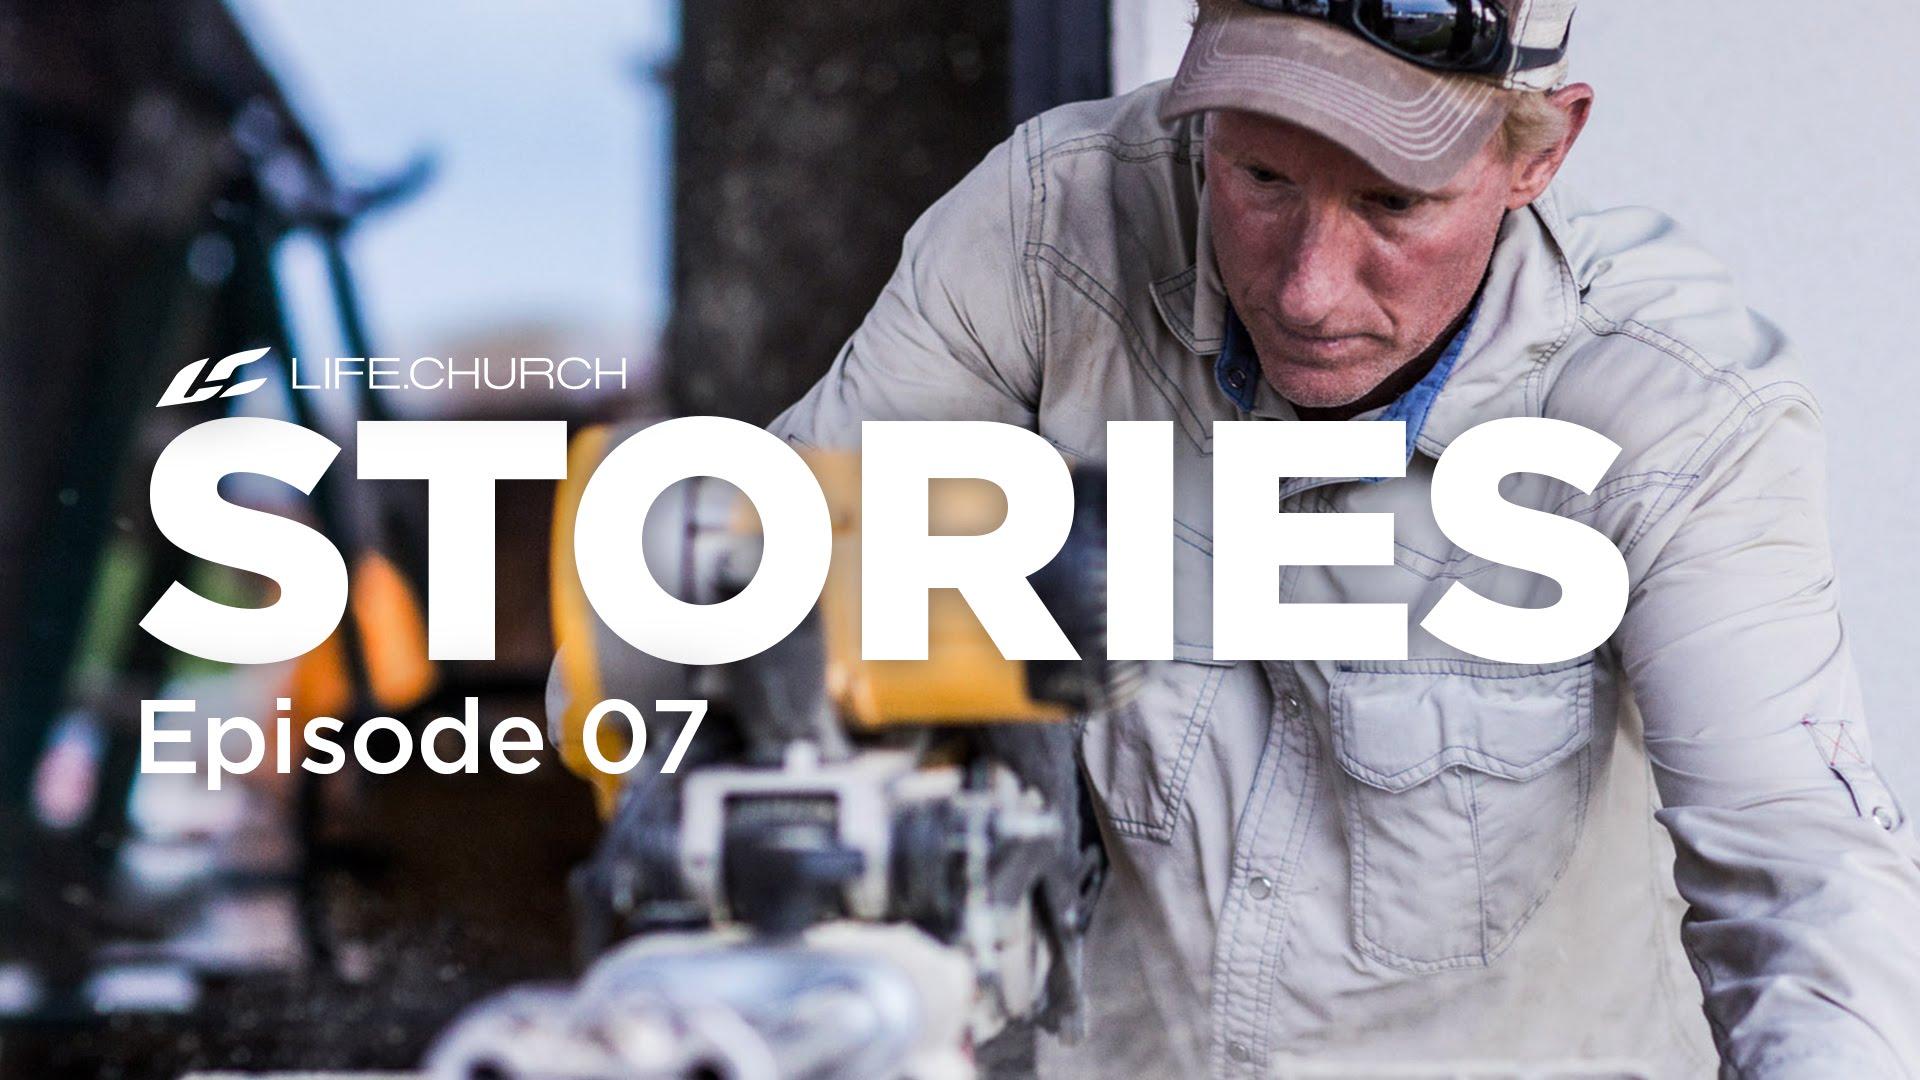 Episode 07 thumbnail